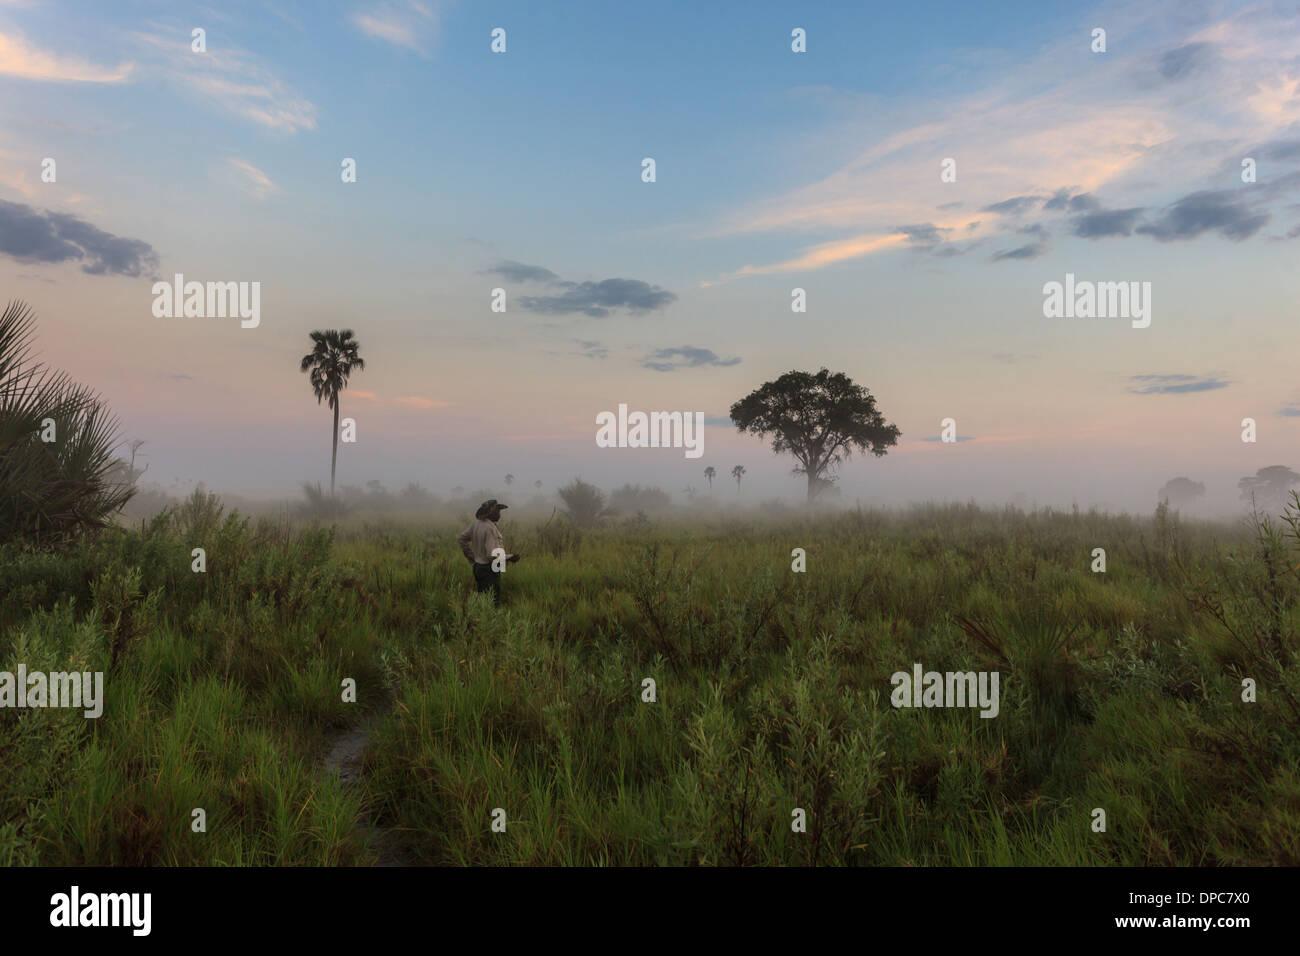 Guida safari studi zone umide per segni di fauna selvatica per mostrare i turisti, Botswana, Africa Immagini Stock